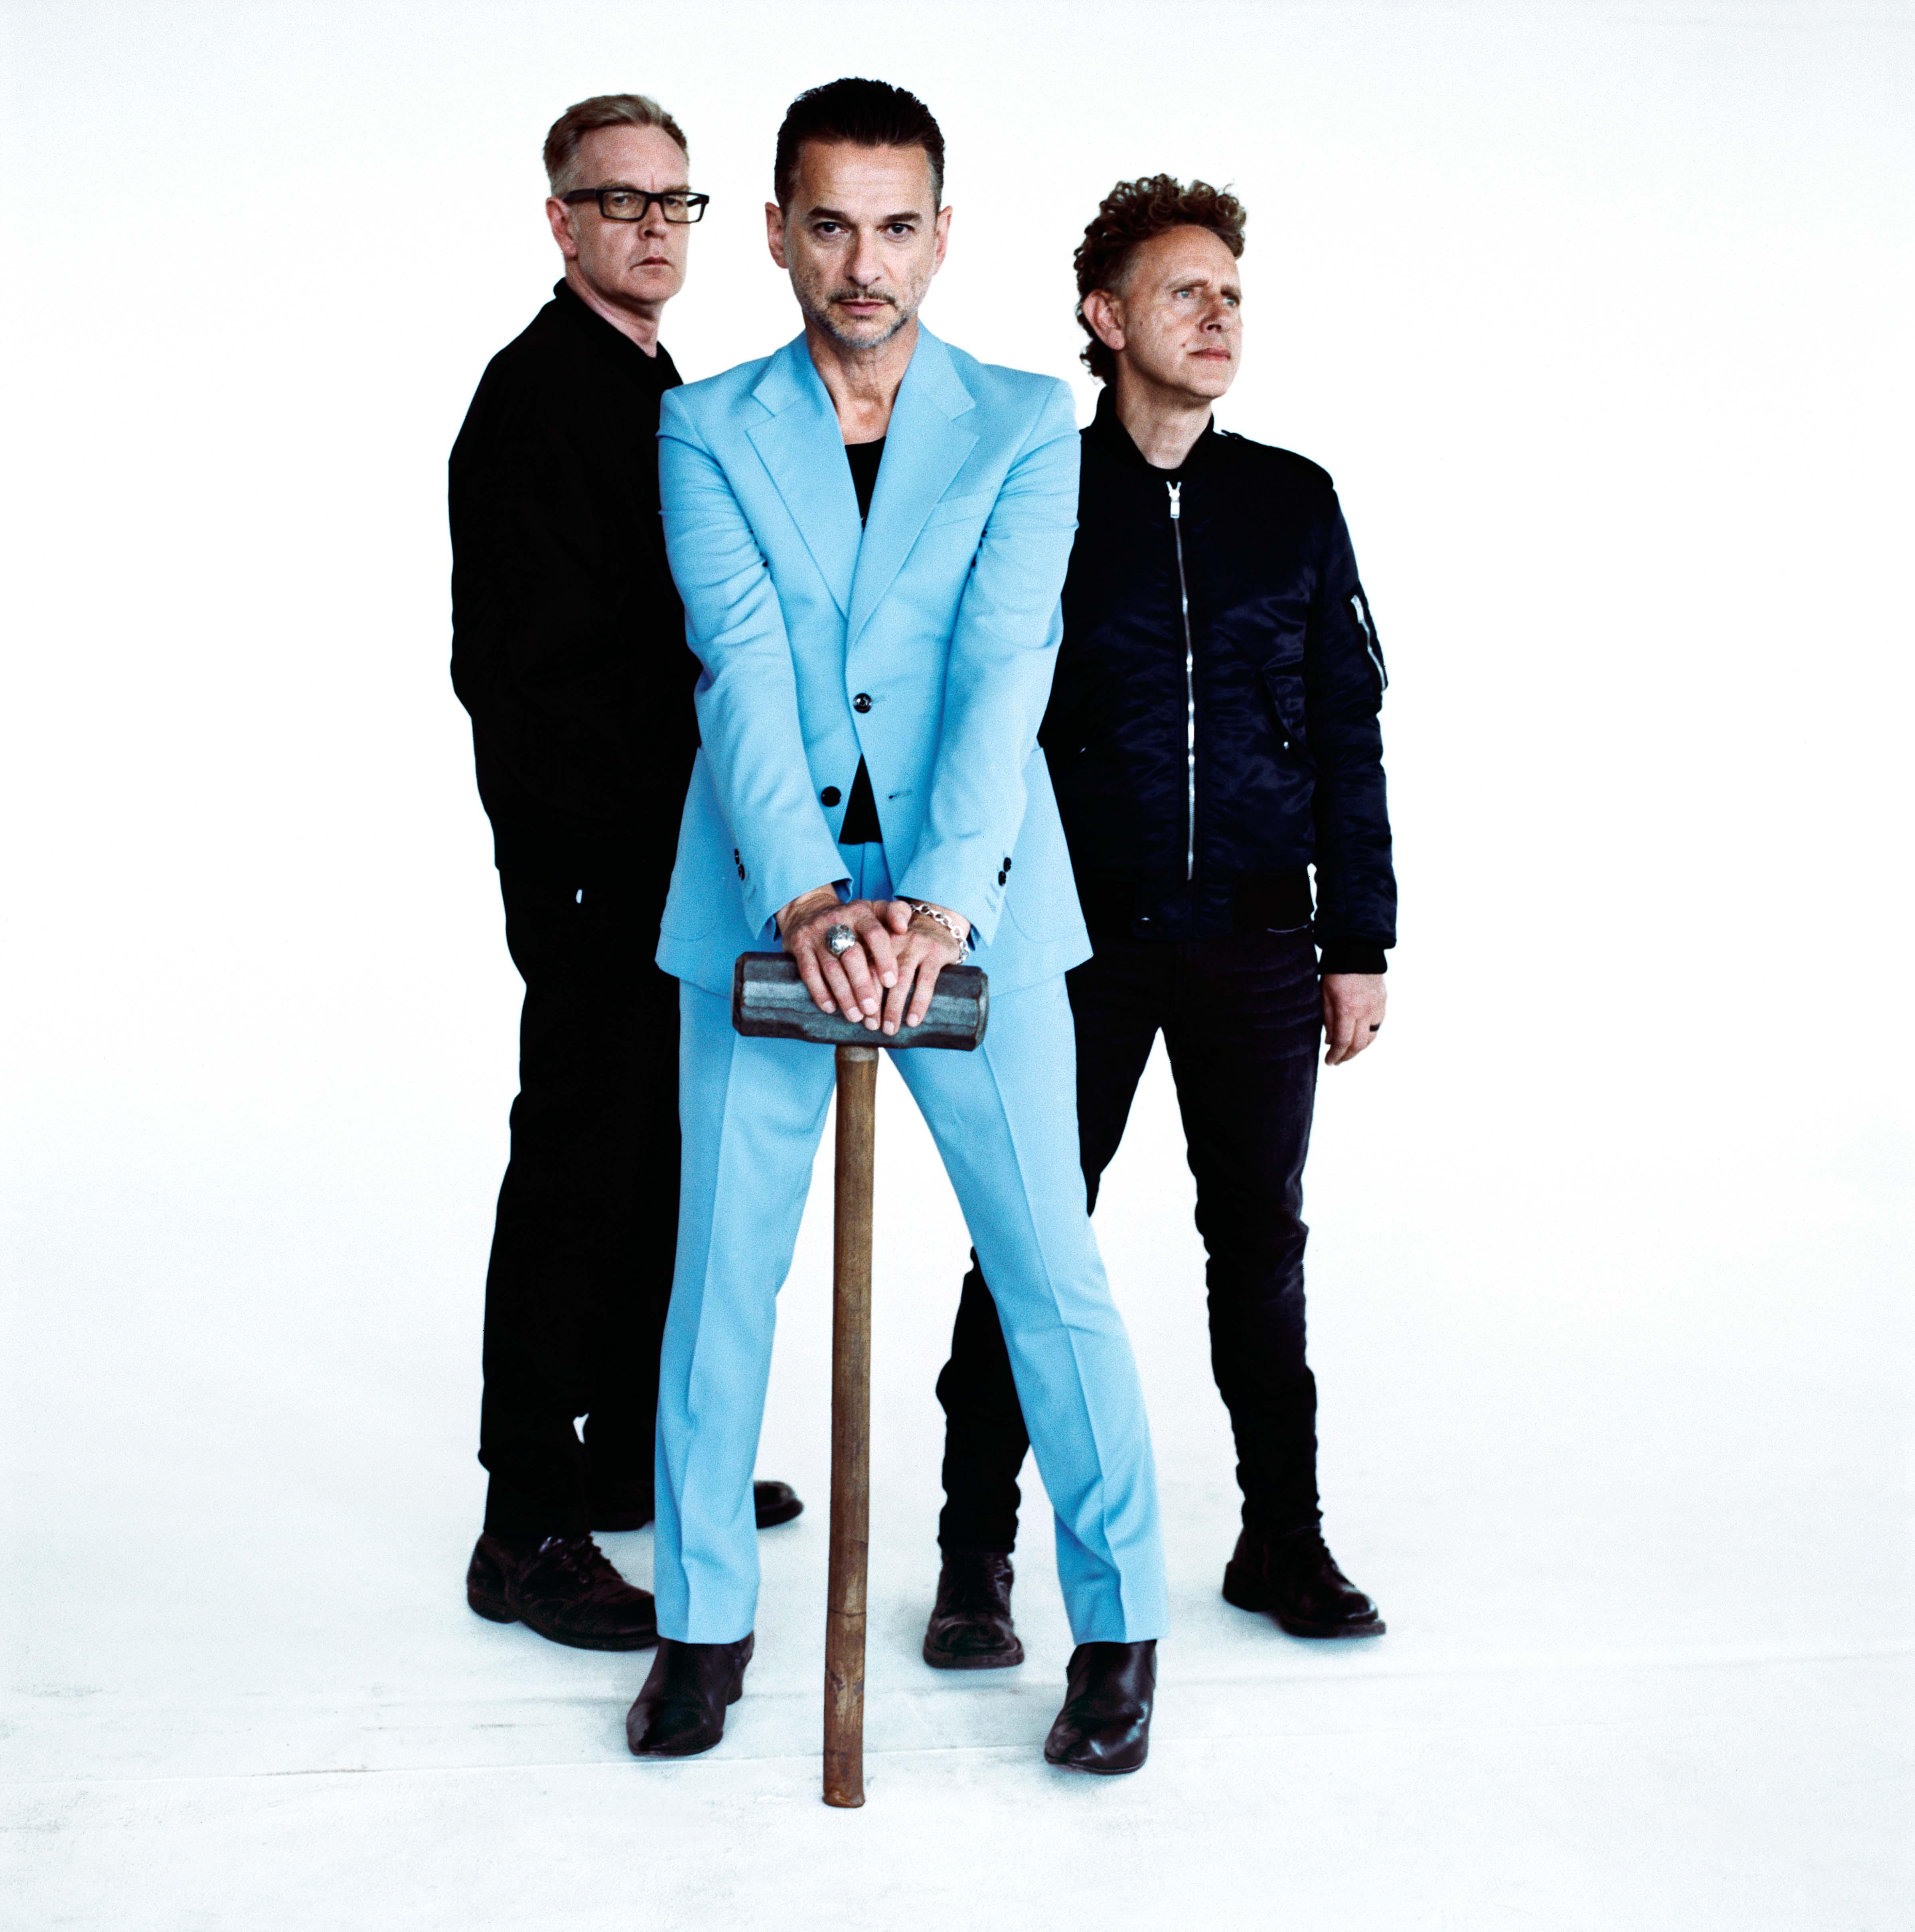 Depeche Mode kündigen Welttournee und Album an